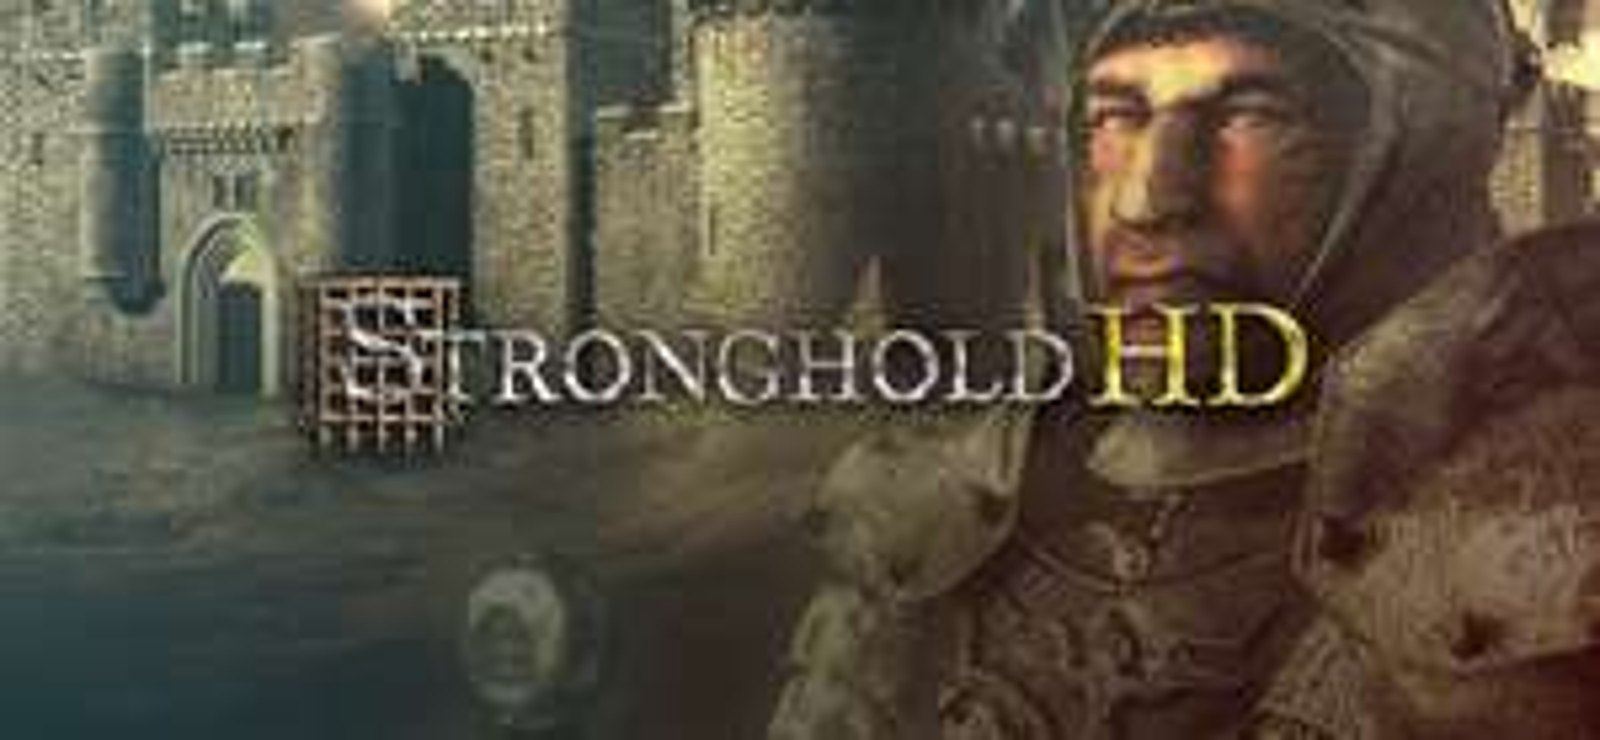 [Gog.com] Stronghold HD Gratis!! nur 48std Schnell ;)